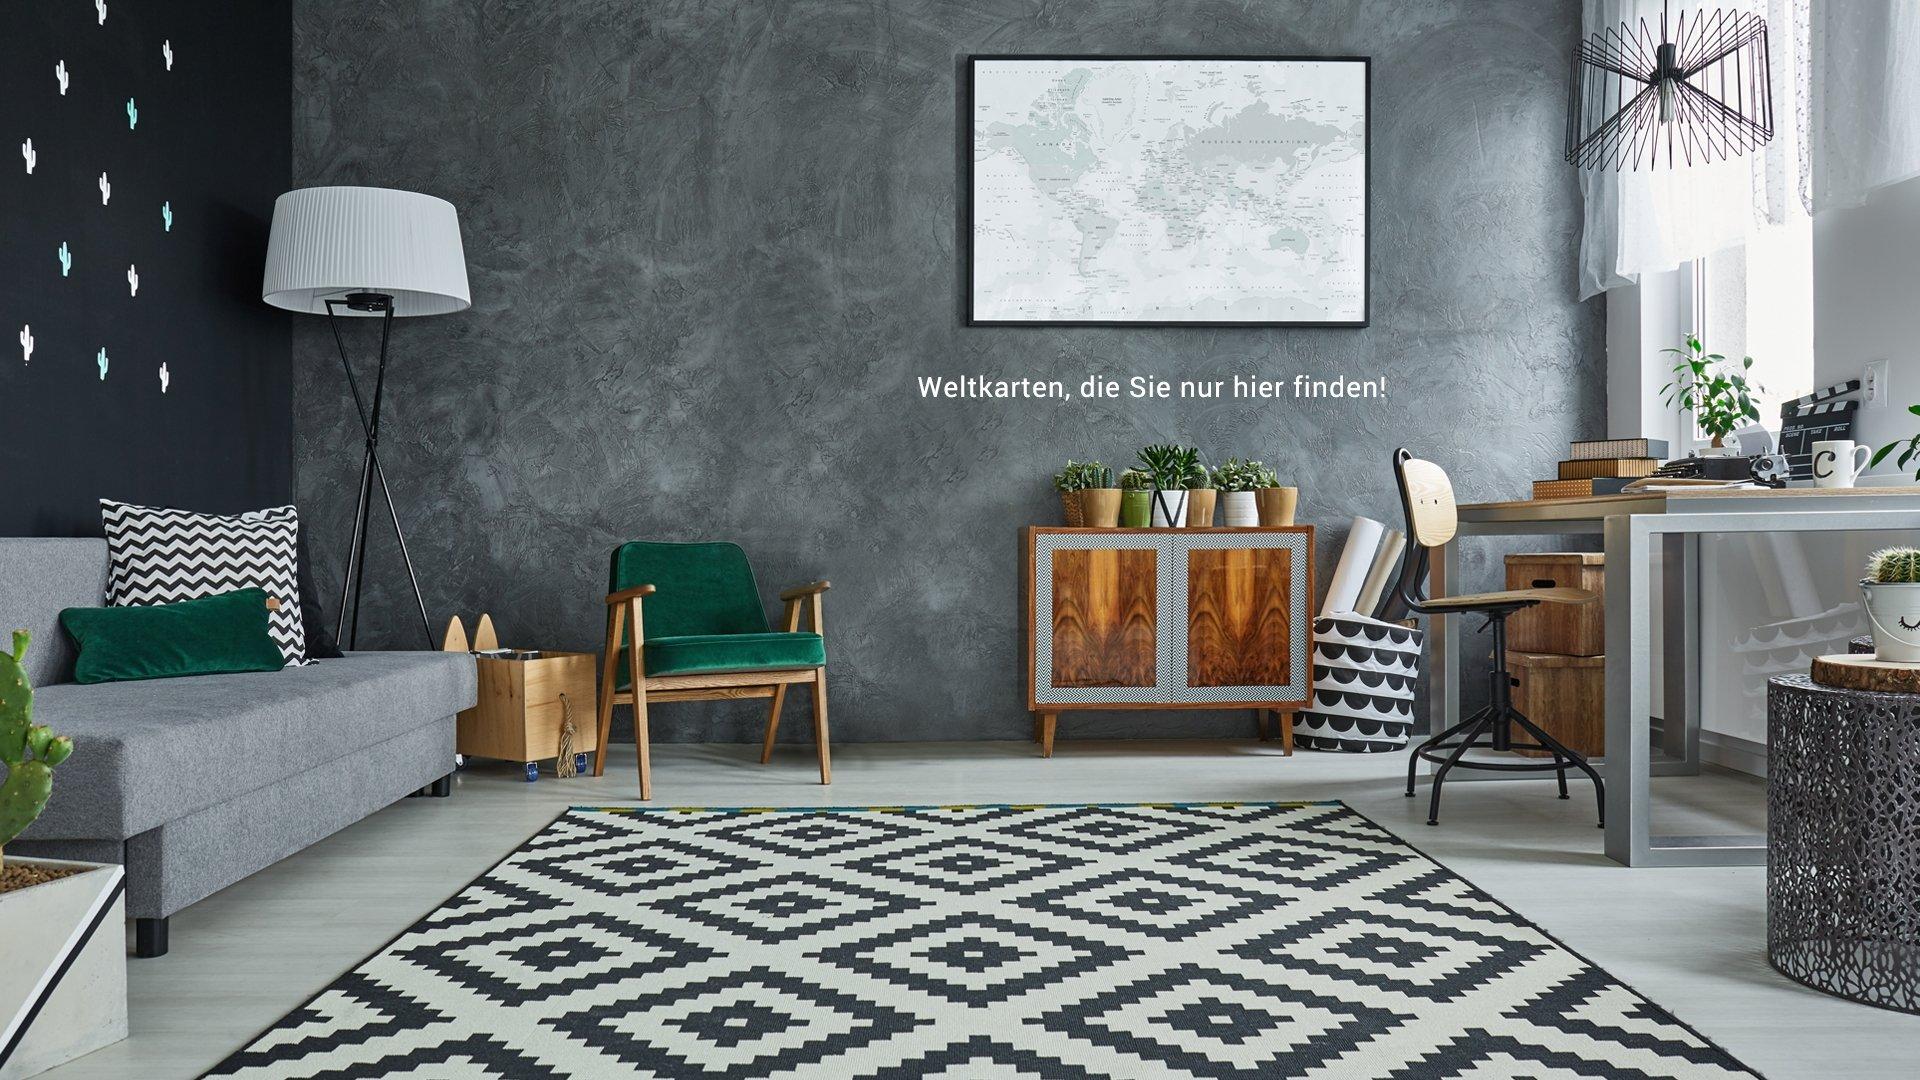 Wereldkaarten.nl Interieur design